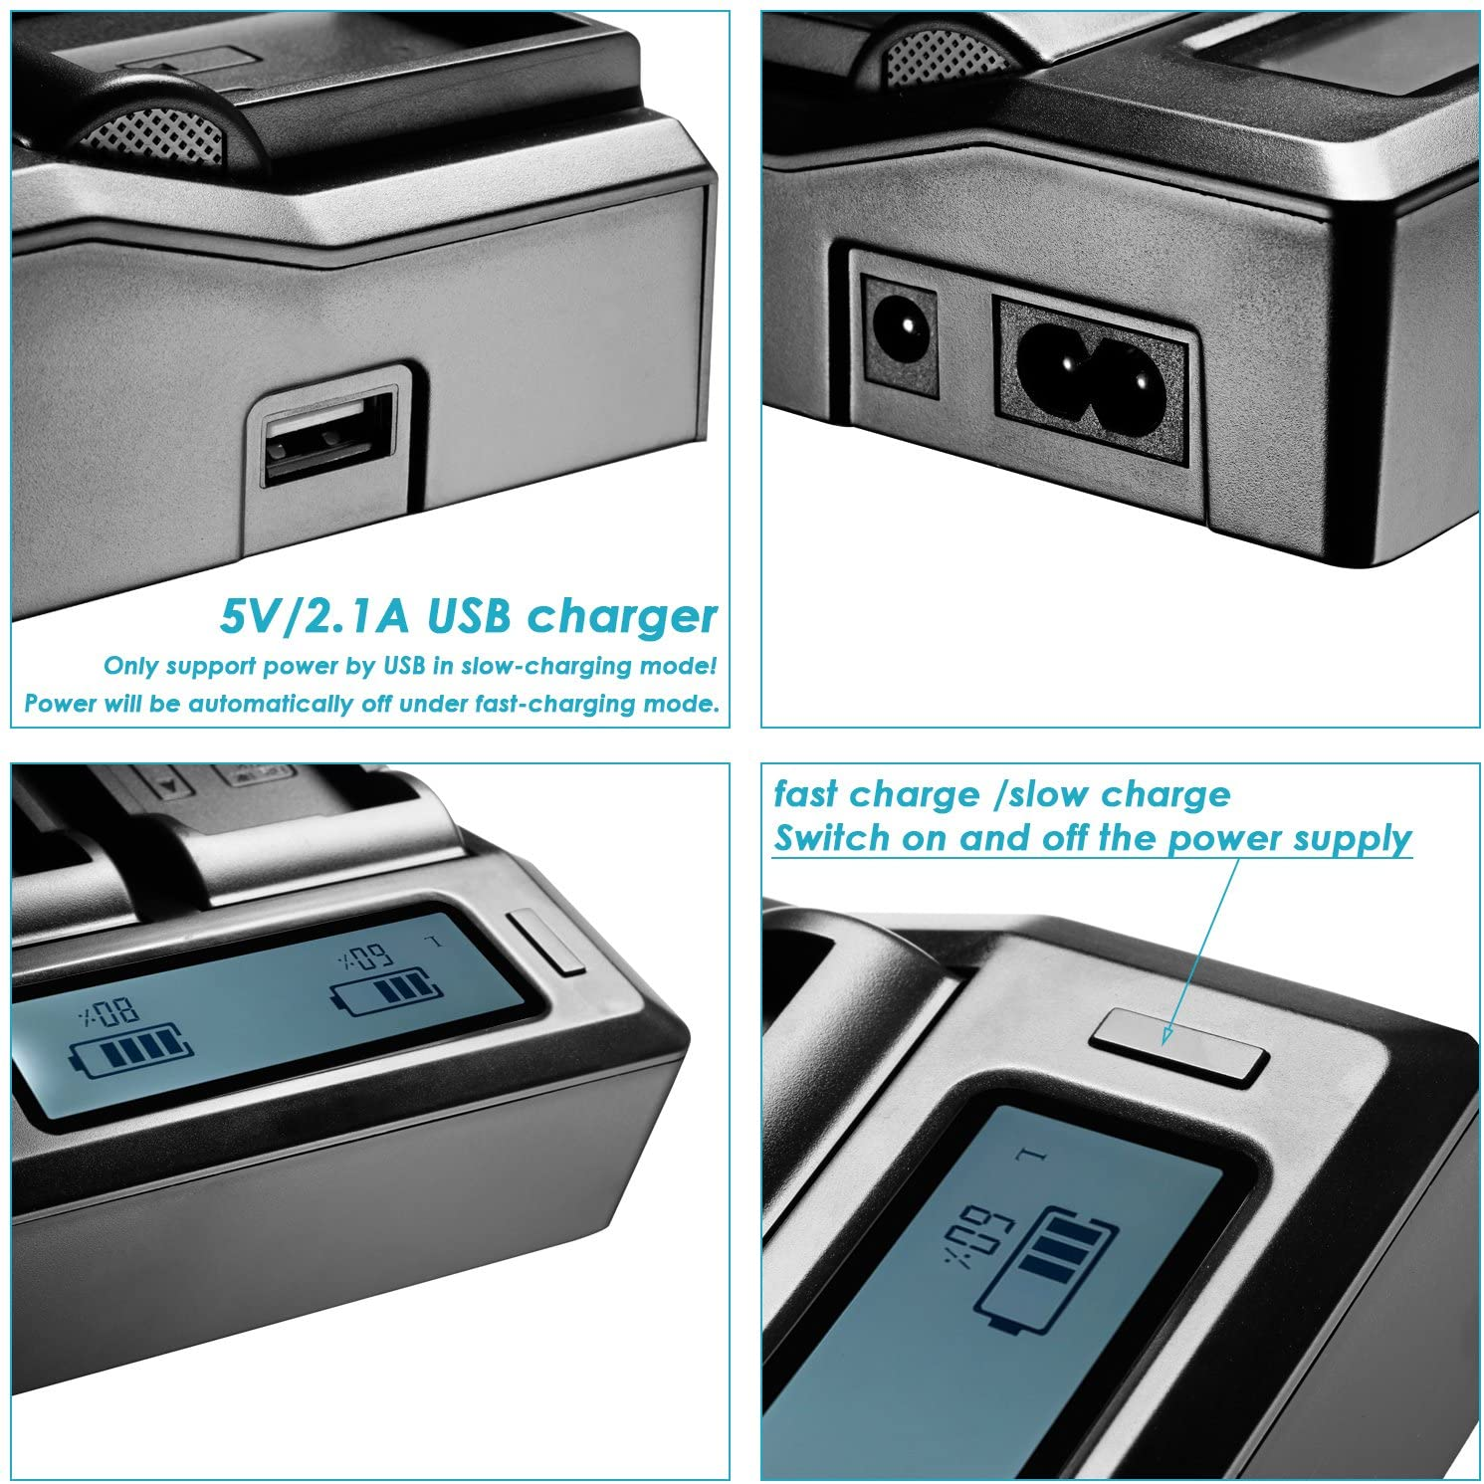 Spina Americana + Spina Europea + Adattatore per Auto Neewer Caricabatterie con Display LCD per Batterie Sony NP-FW50 Compatibile con Sony NEX-3//5//6//7//C3//F3 SLT-A33//A37//A55